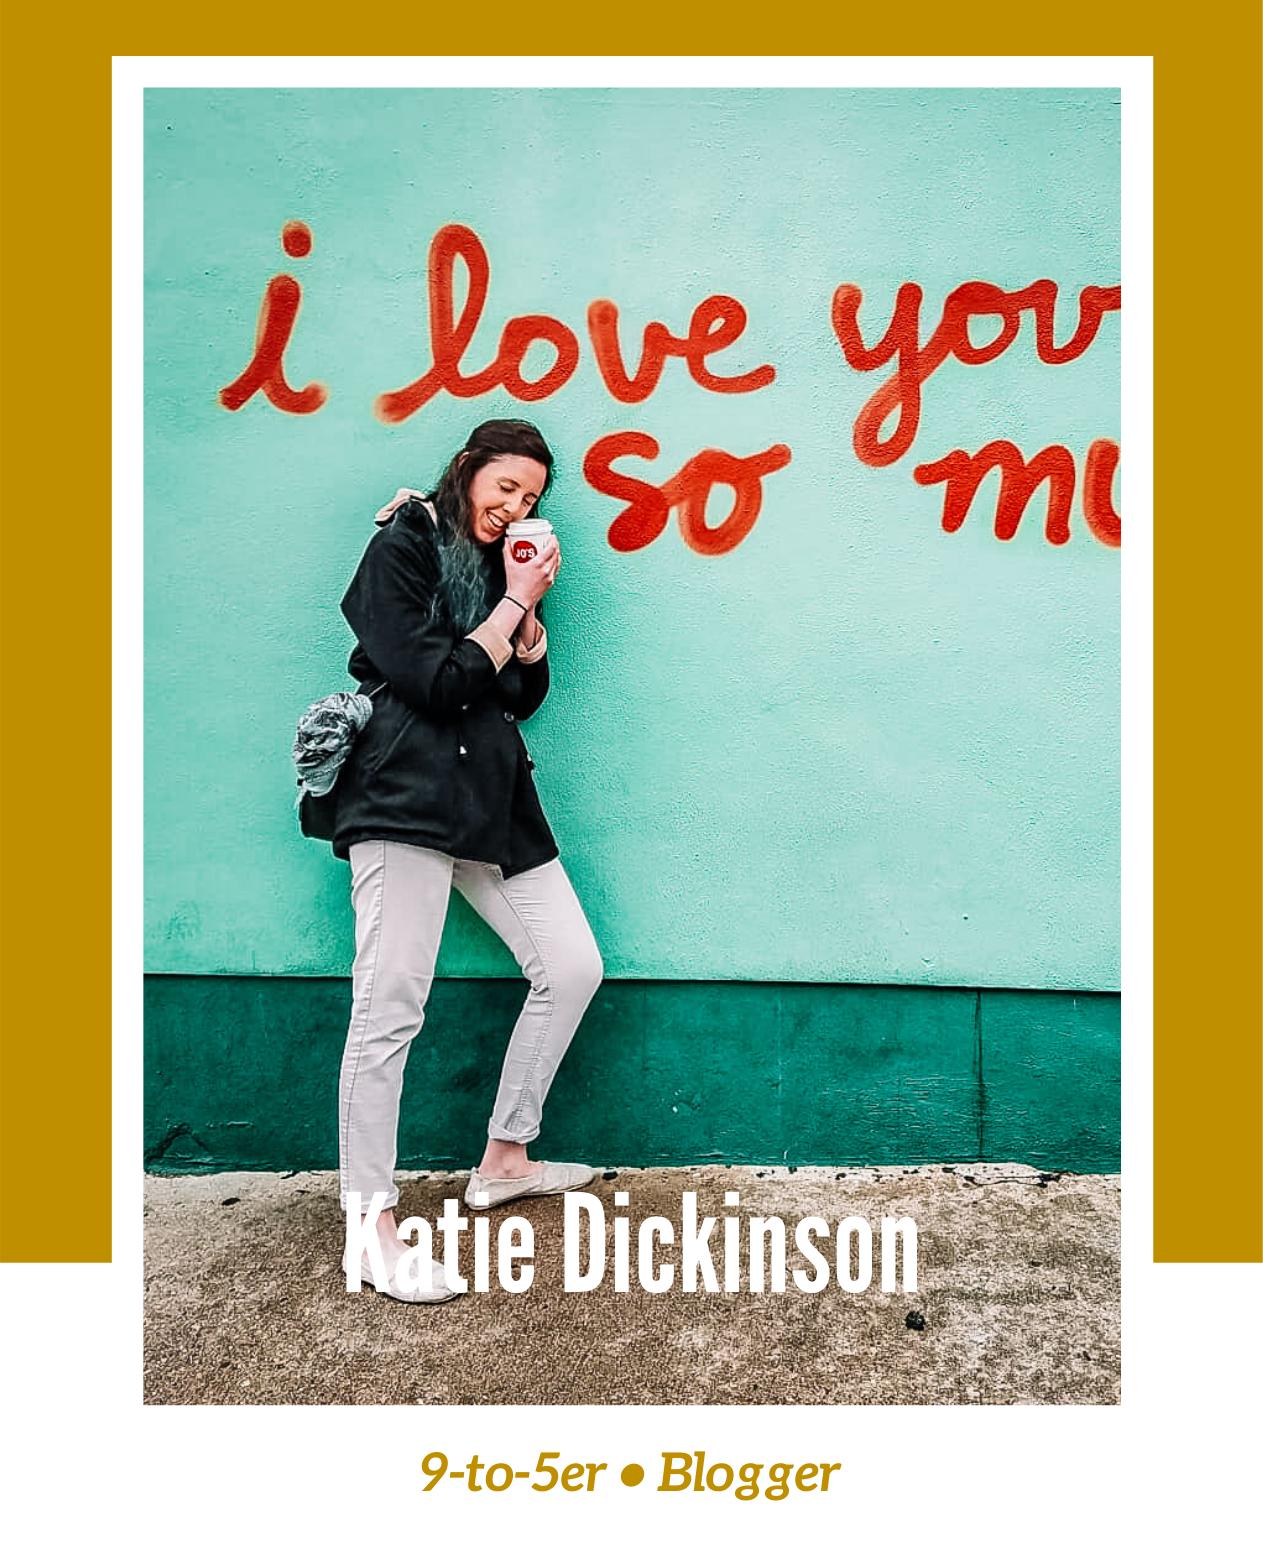 Rachel Off Duty: Stories Beyond the 9 to 5 - Episode 4 - Katie Dickinson